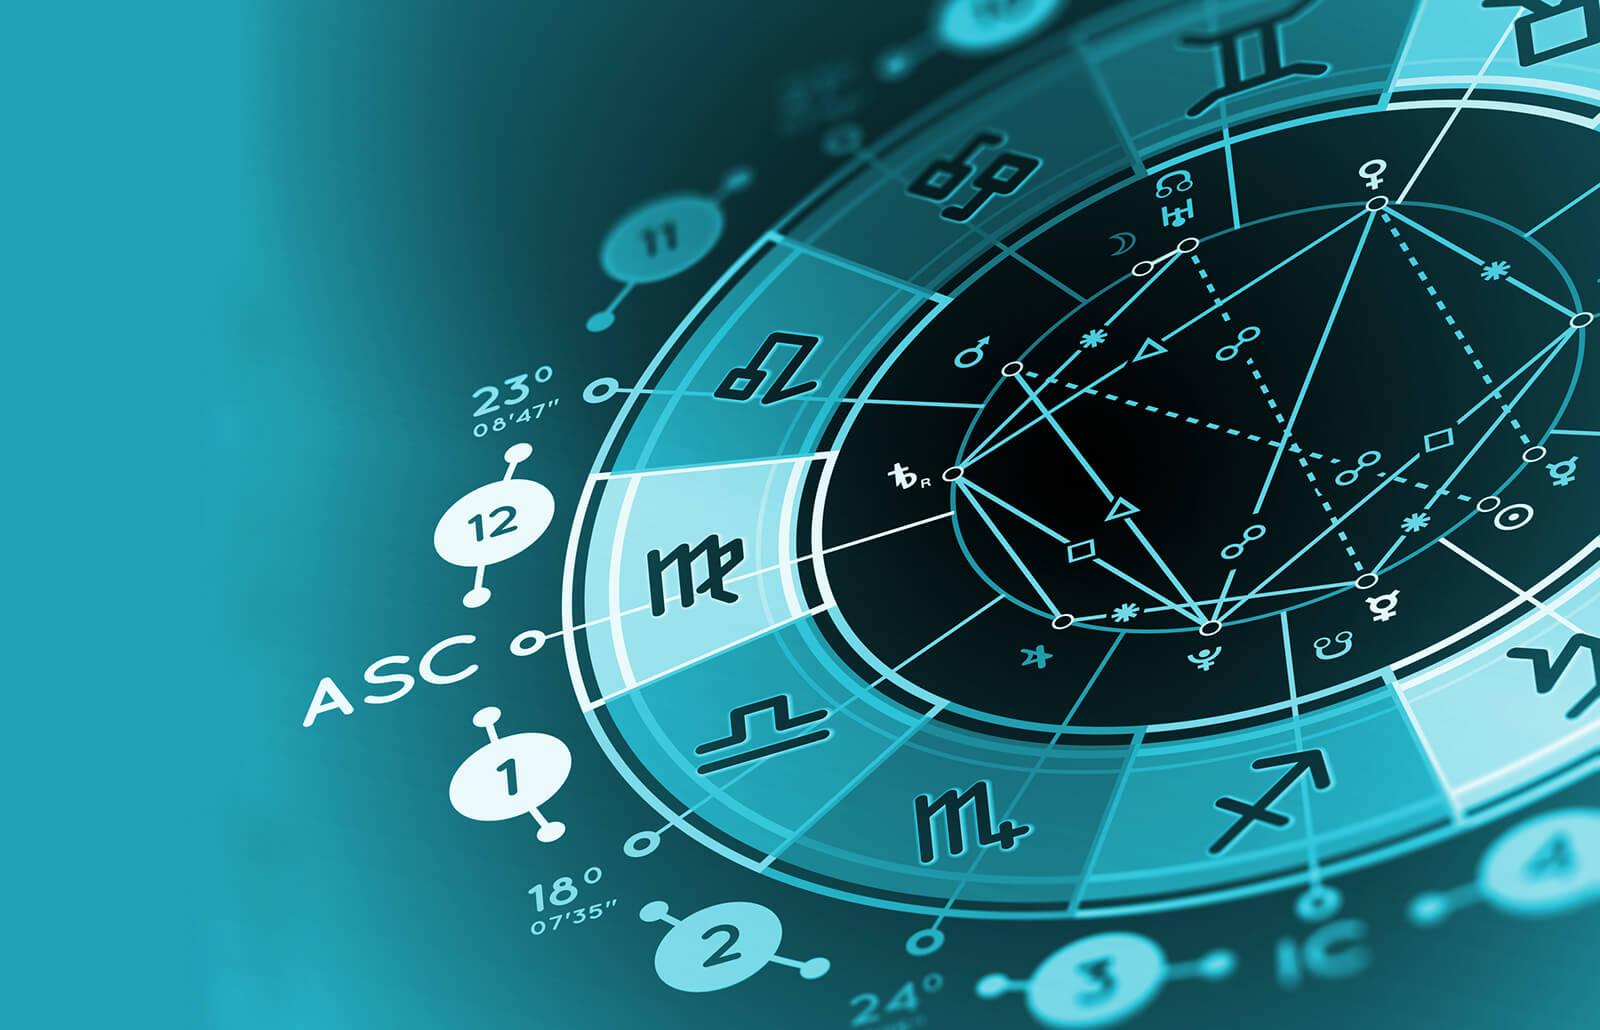 Understanding Degrees in an Astrology Chart   LoveToKnow